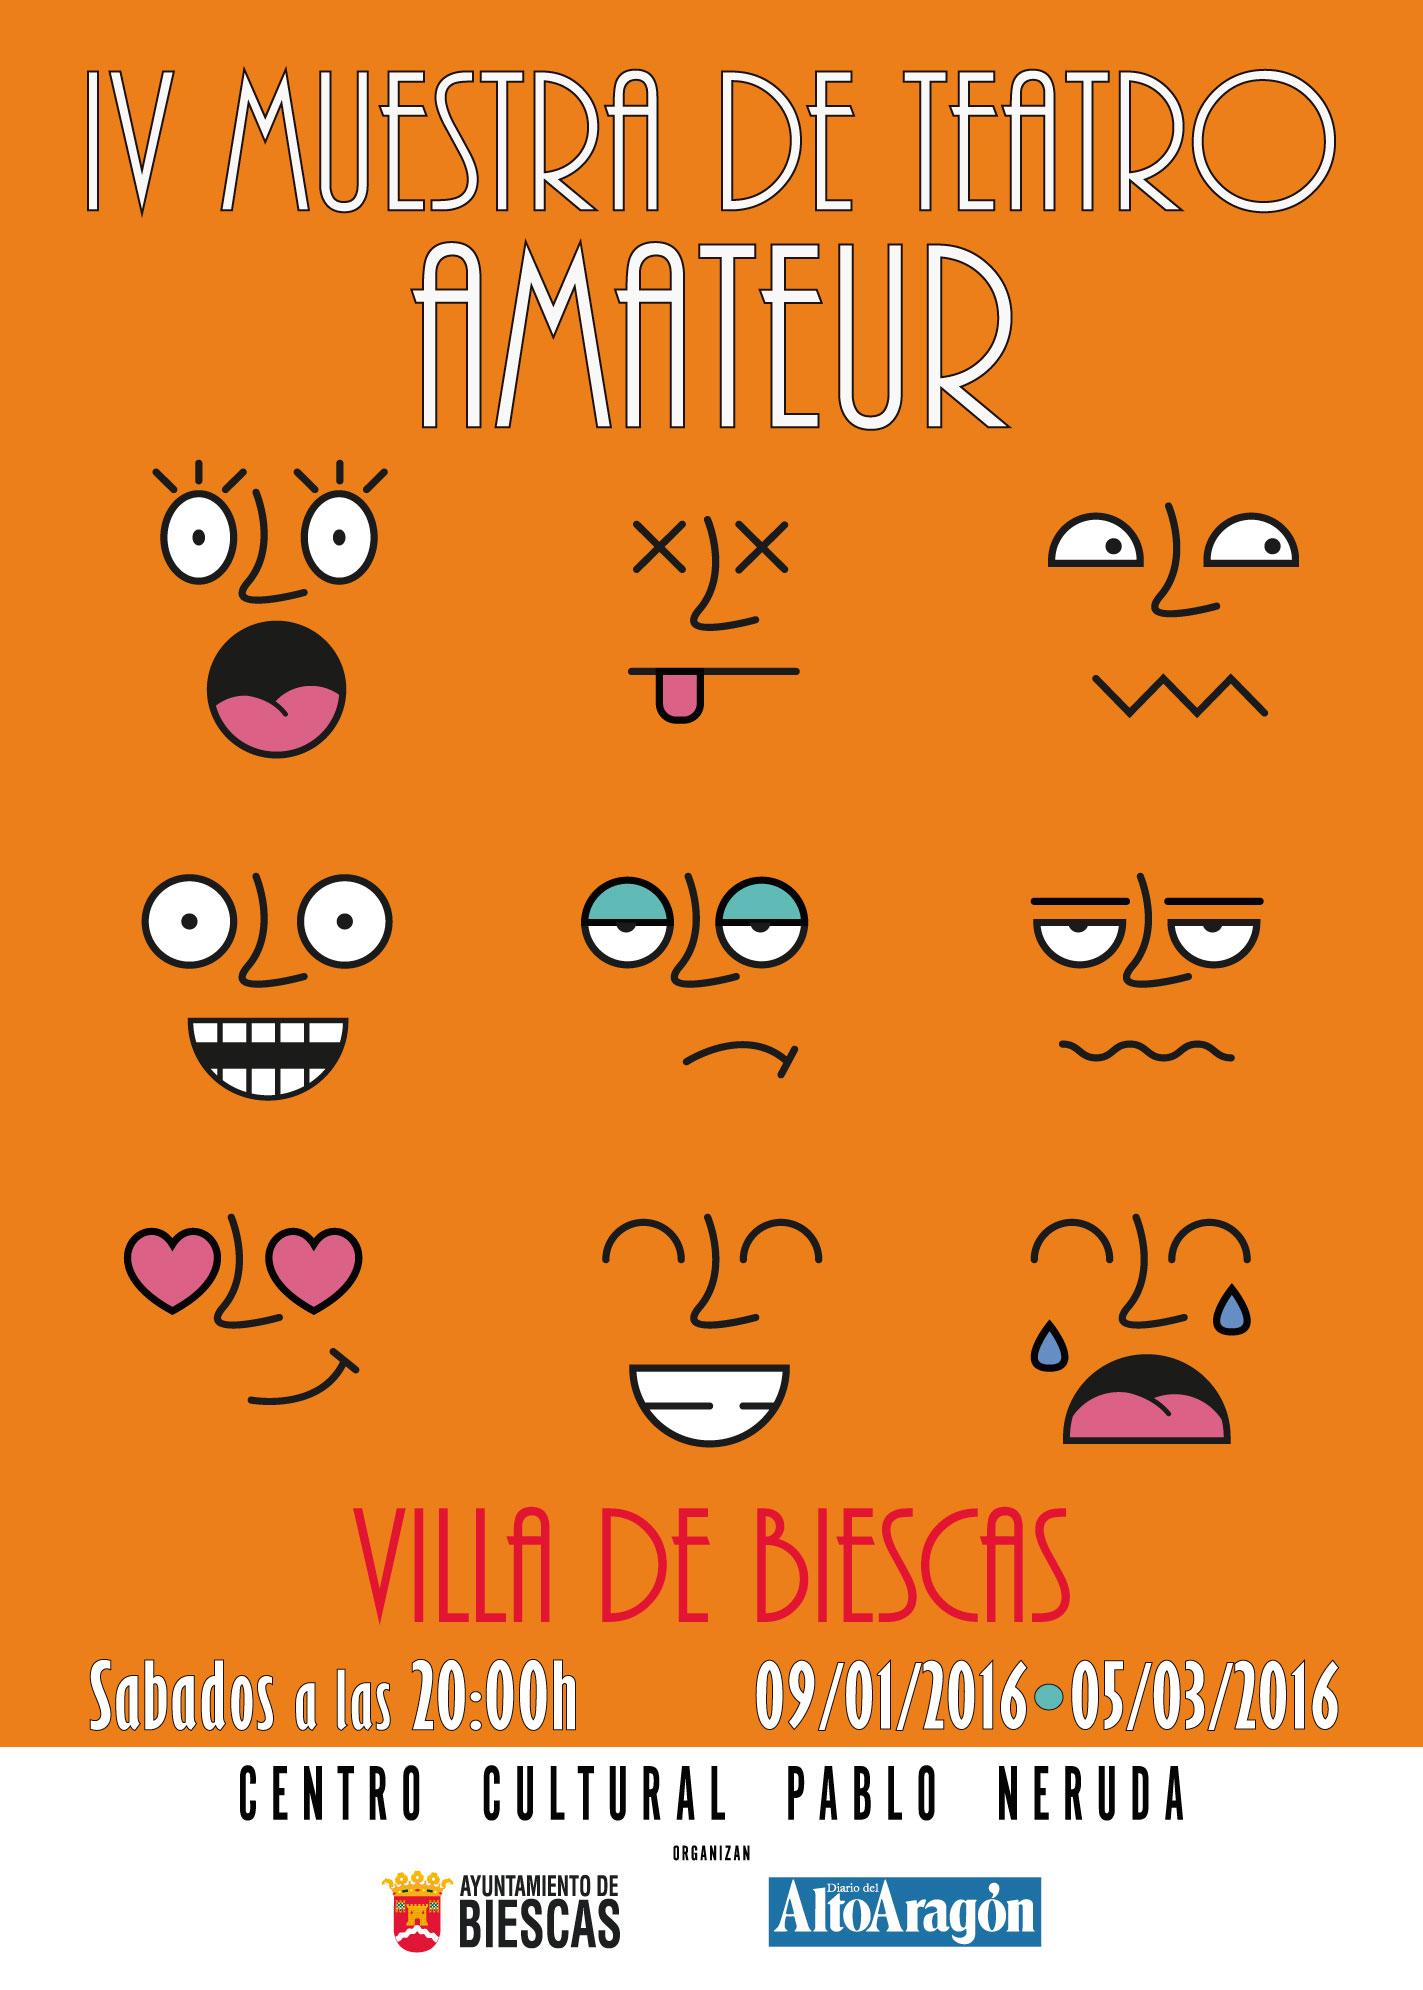 cartel-muestra-de-teatro-amateur-iv-4